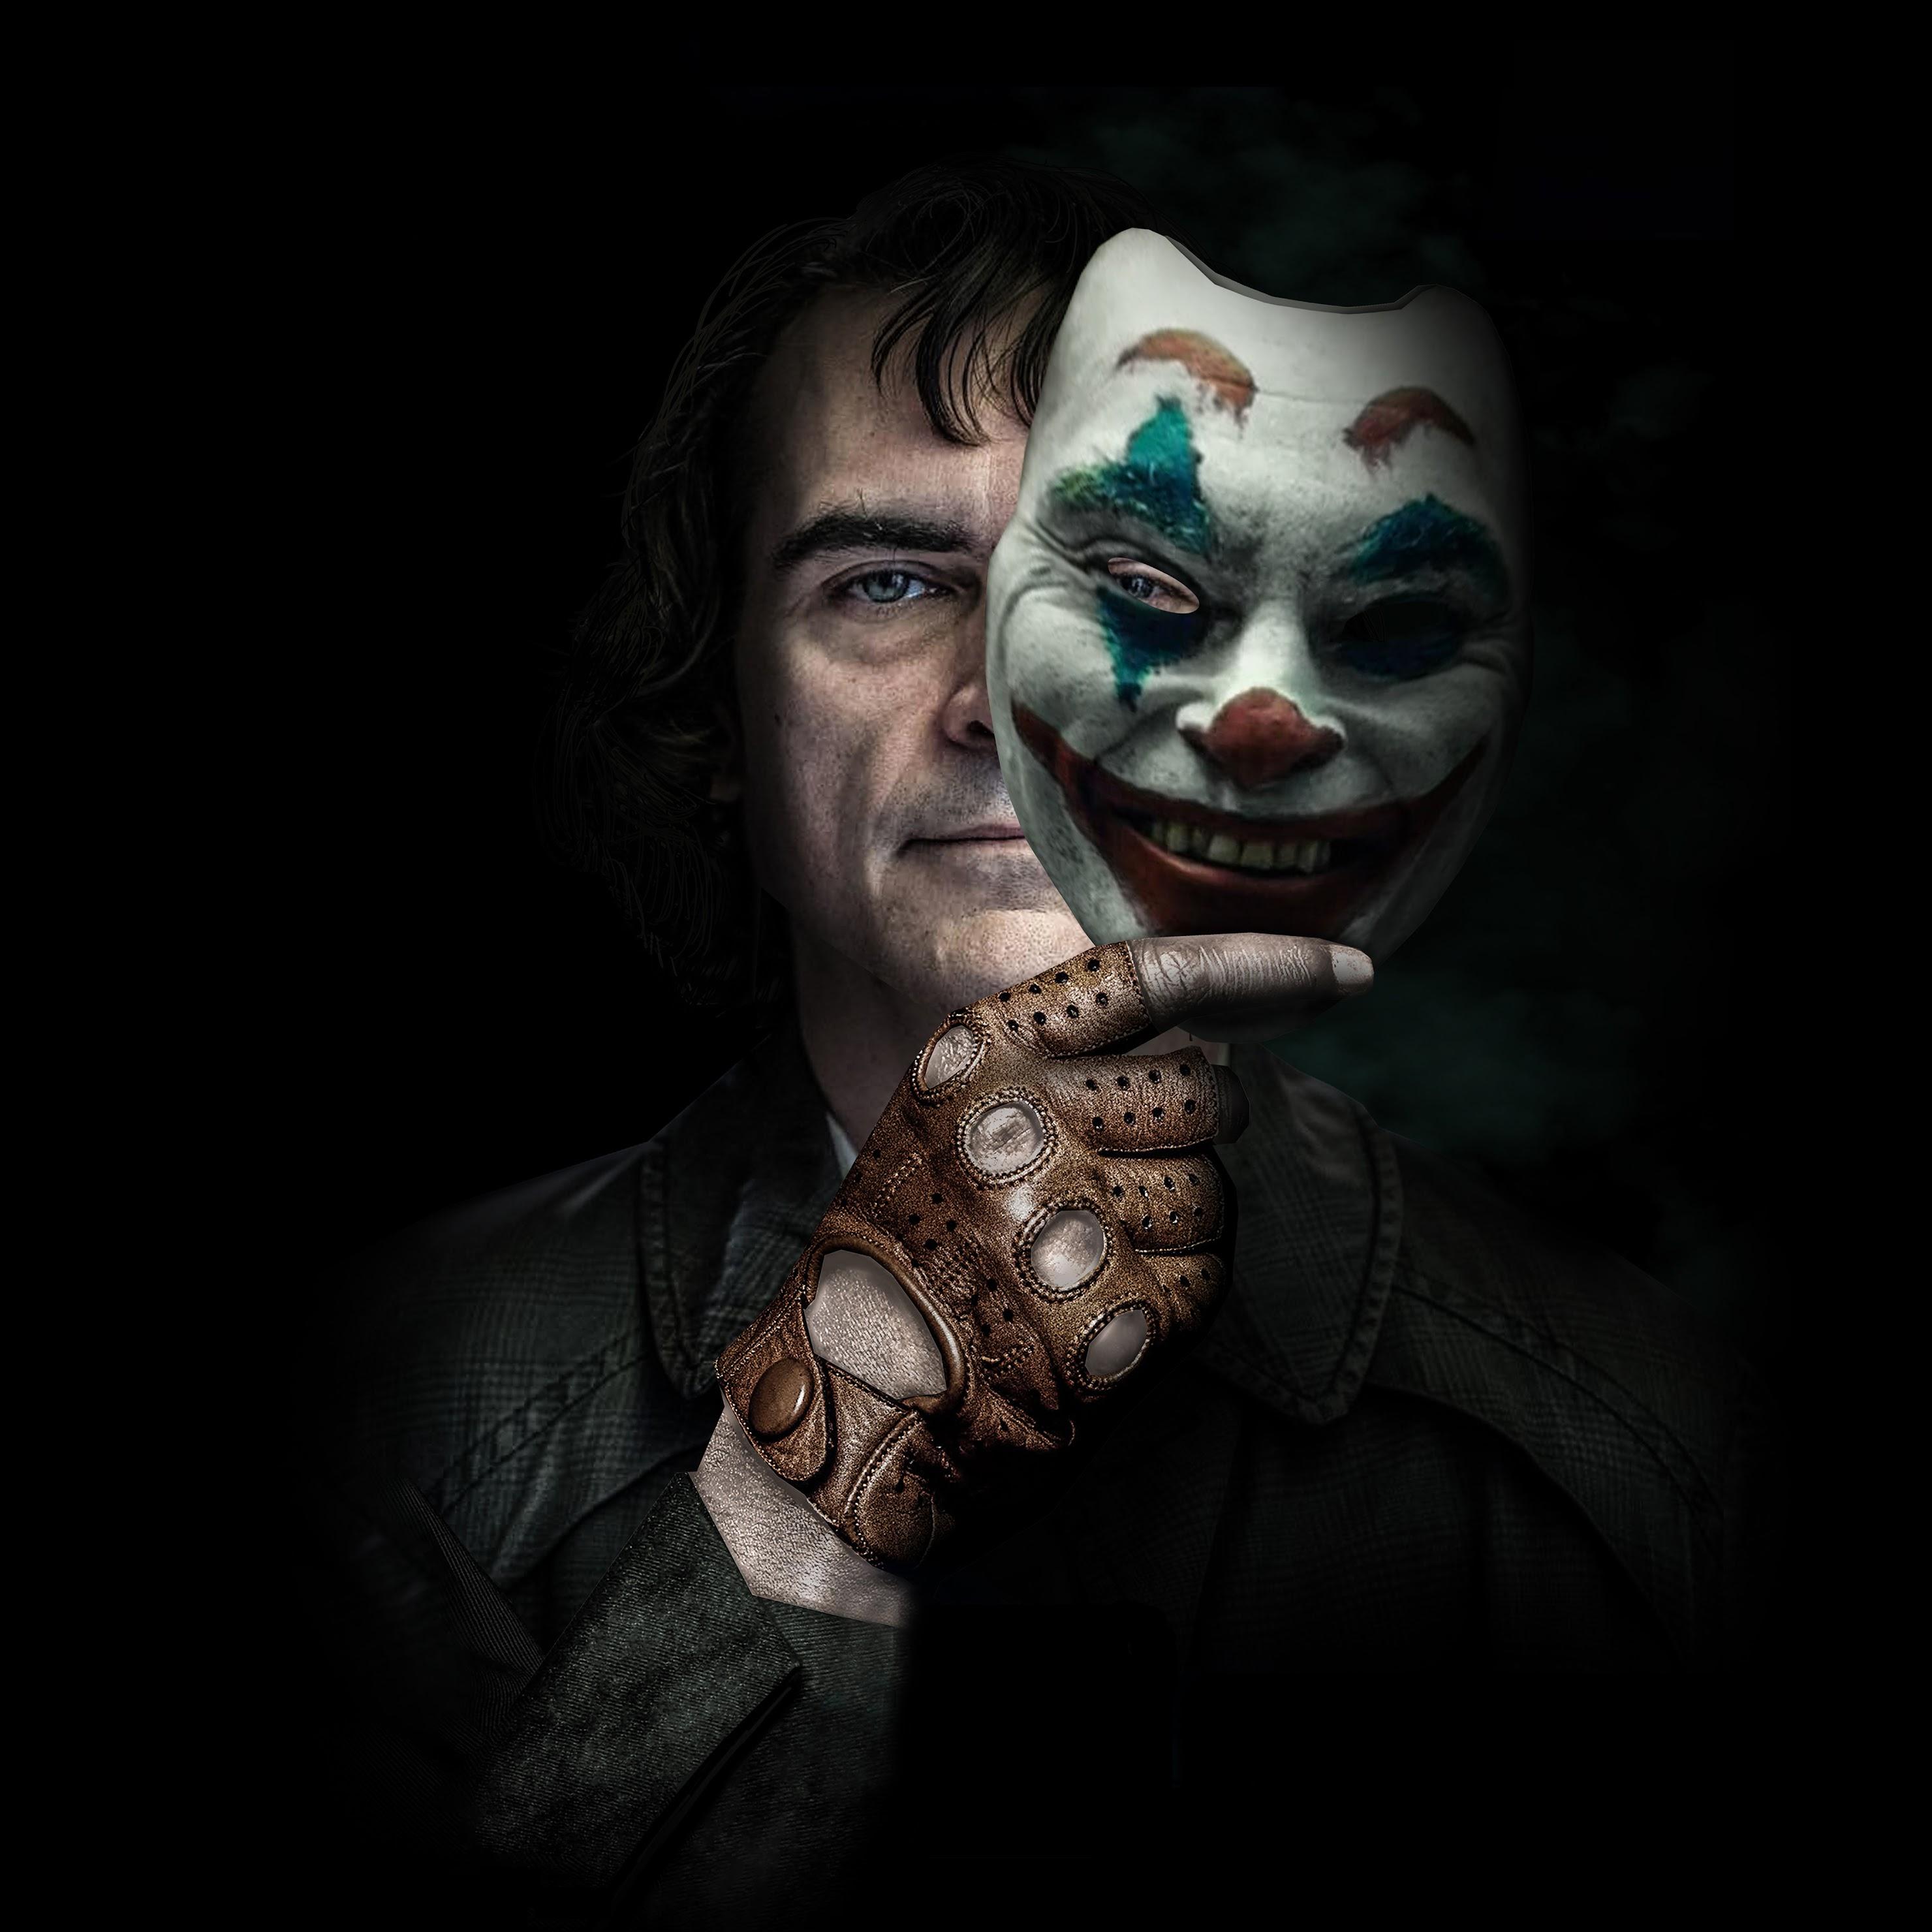 Joker 2019 Joaquin Phoenix 8k 13 Wallpaper